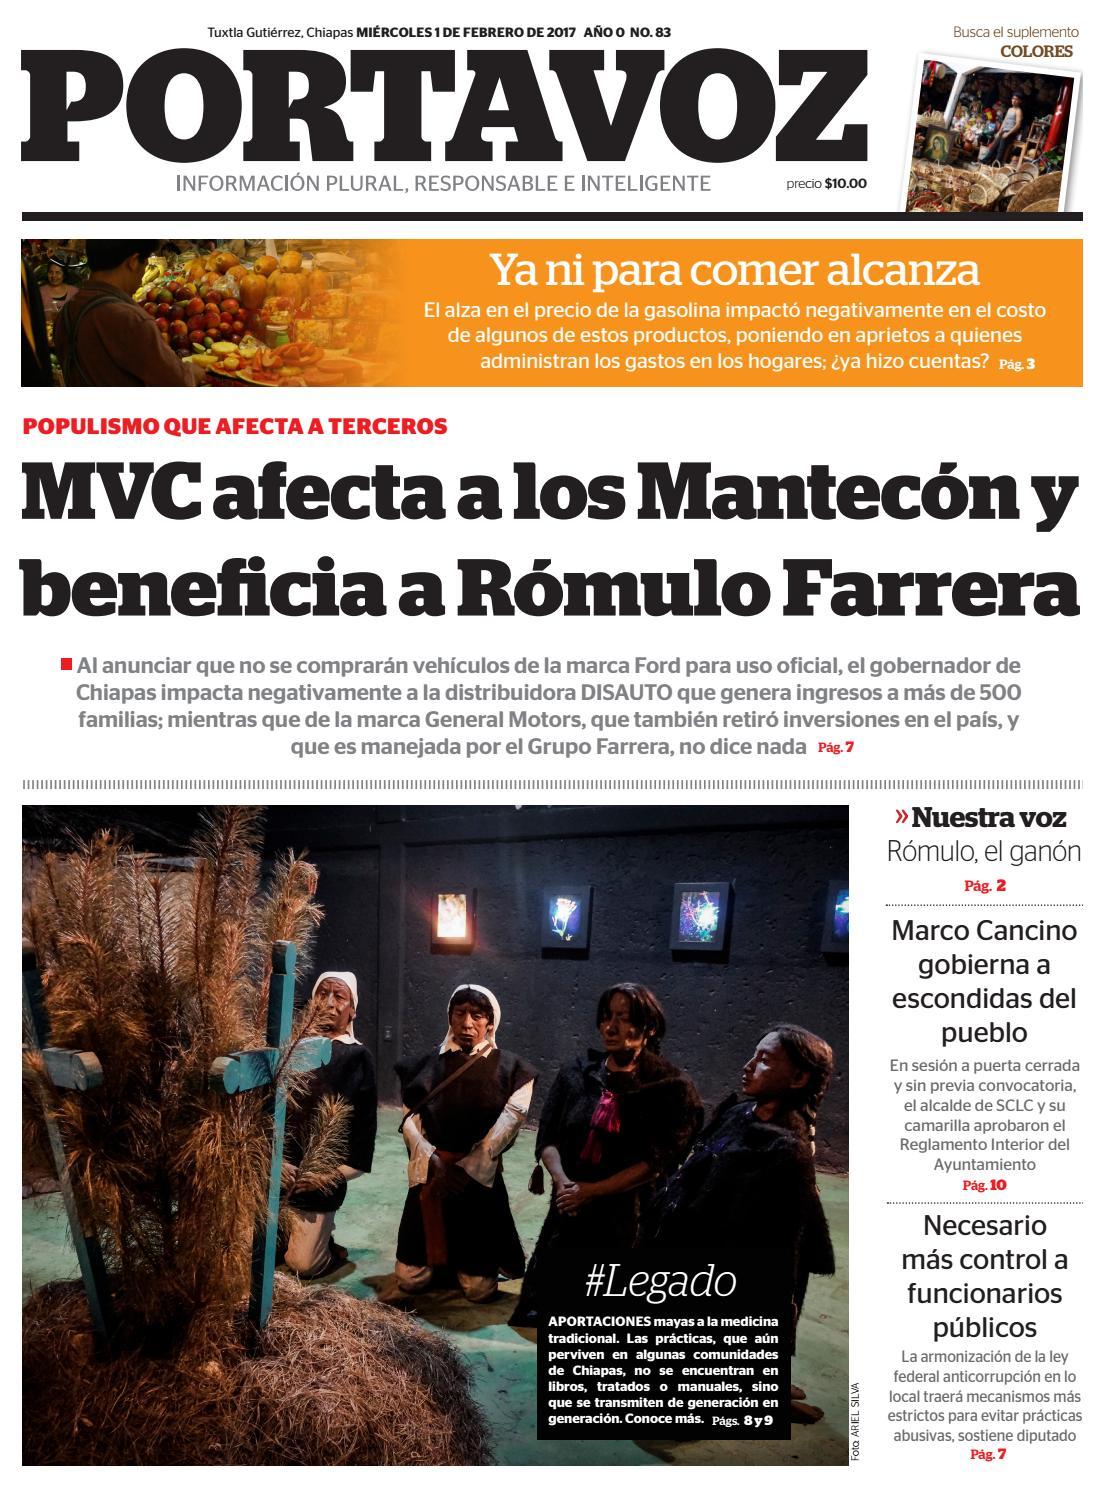 Portavoz 1Feb2017 by Diario Portavoz - issuu